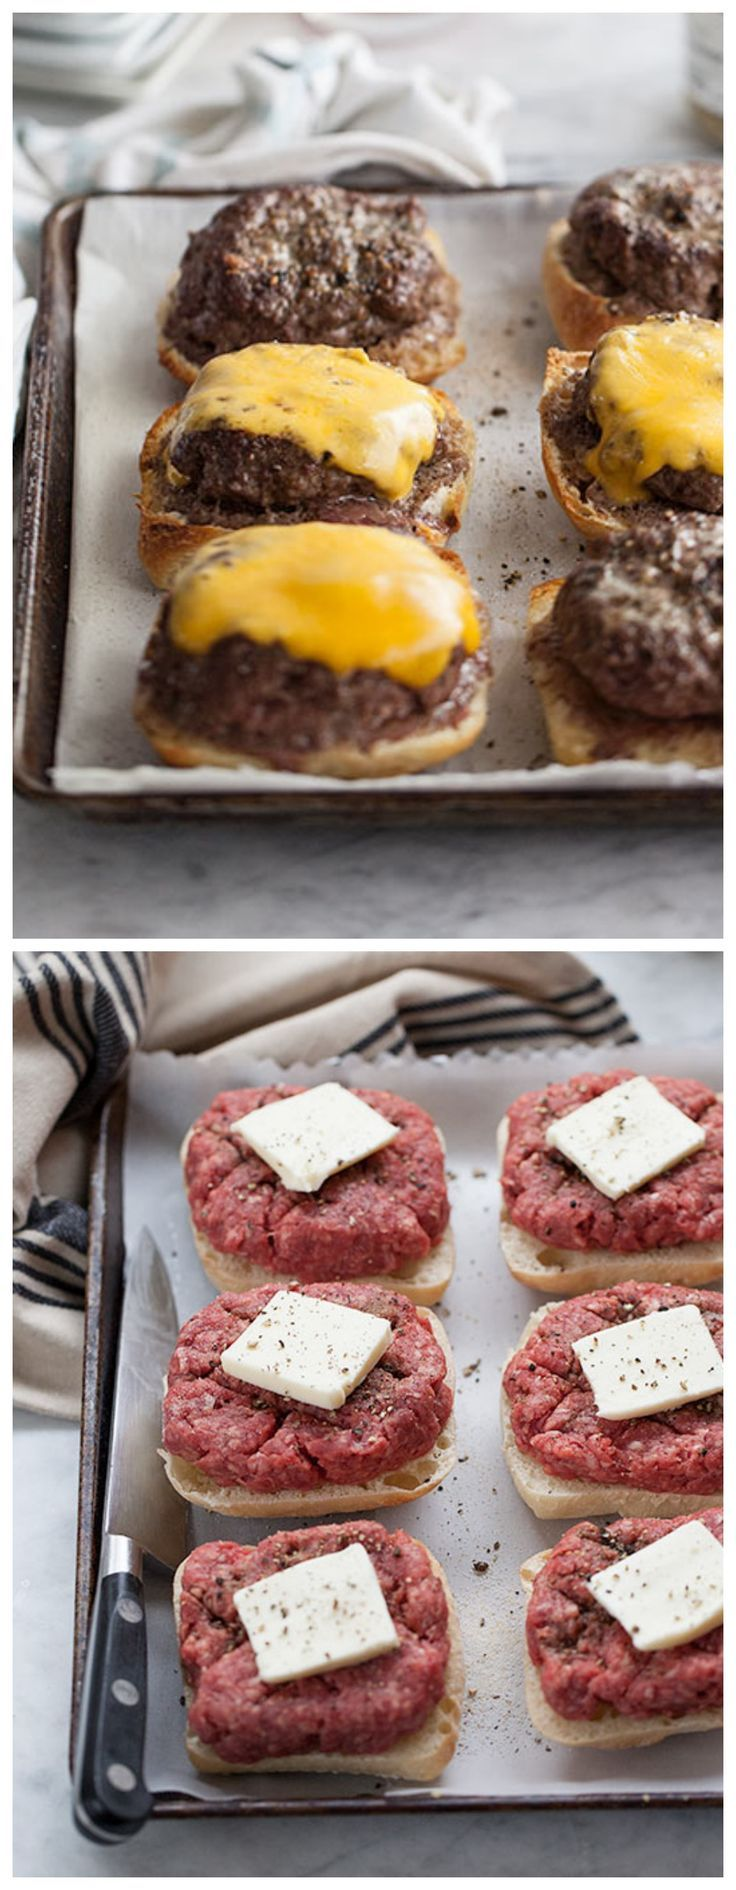 Ev Hamburgeri | Ev Kokusu